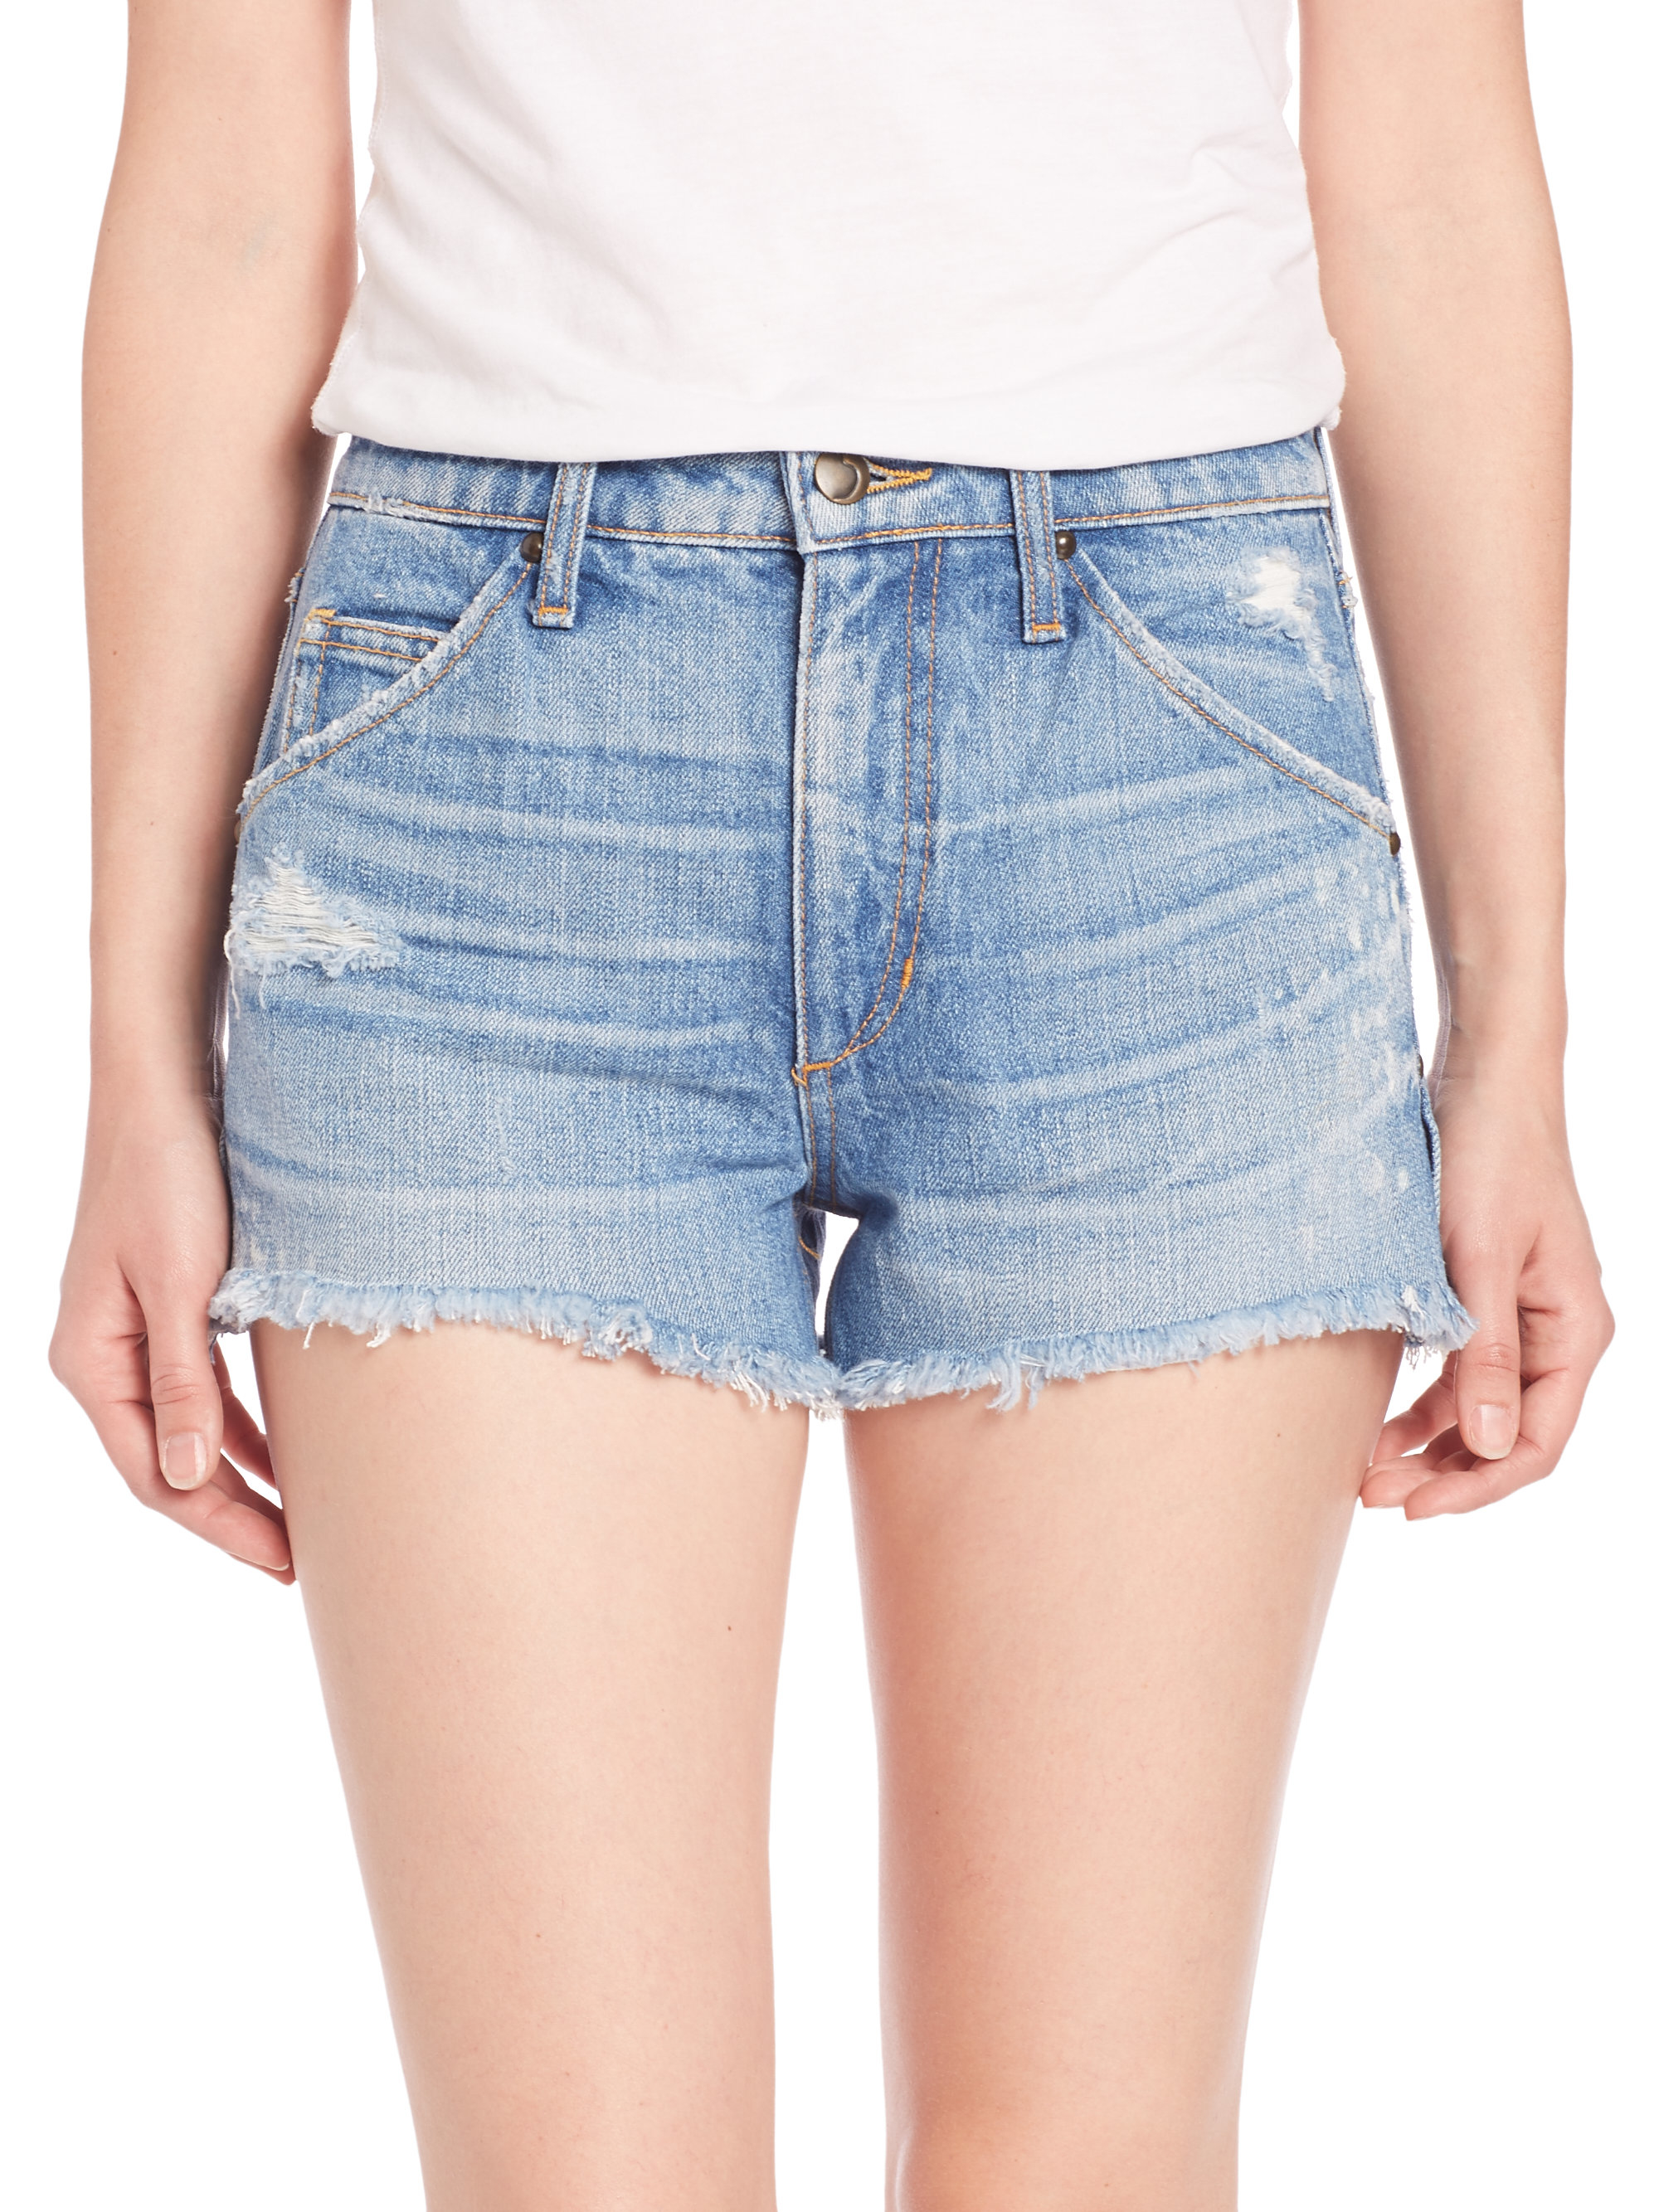 Joe's jeans Wasteland Distressed Cutoff Jean Shorts in Blue | Lyst